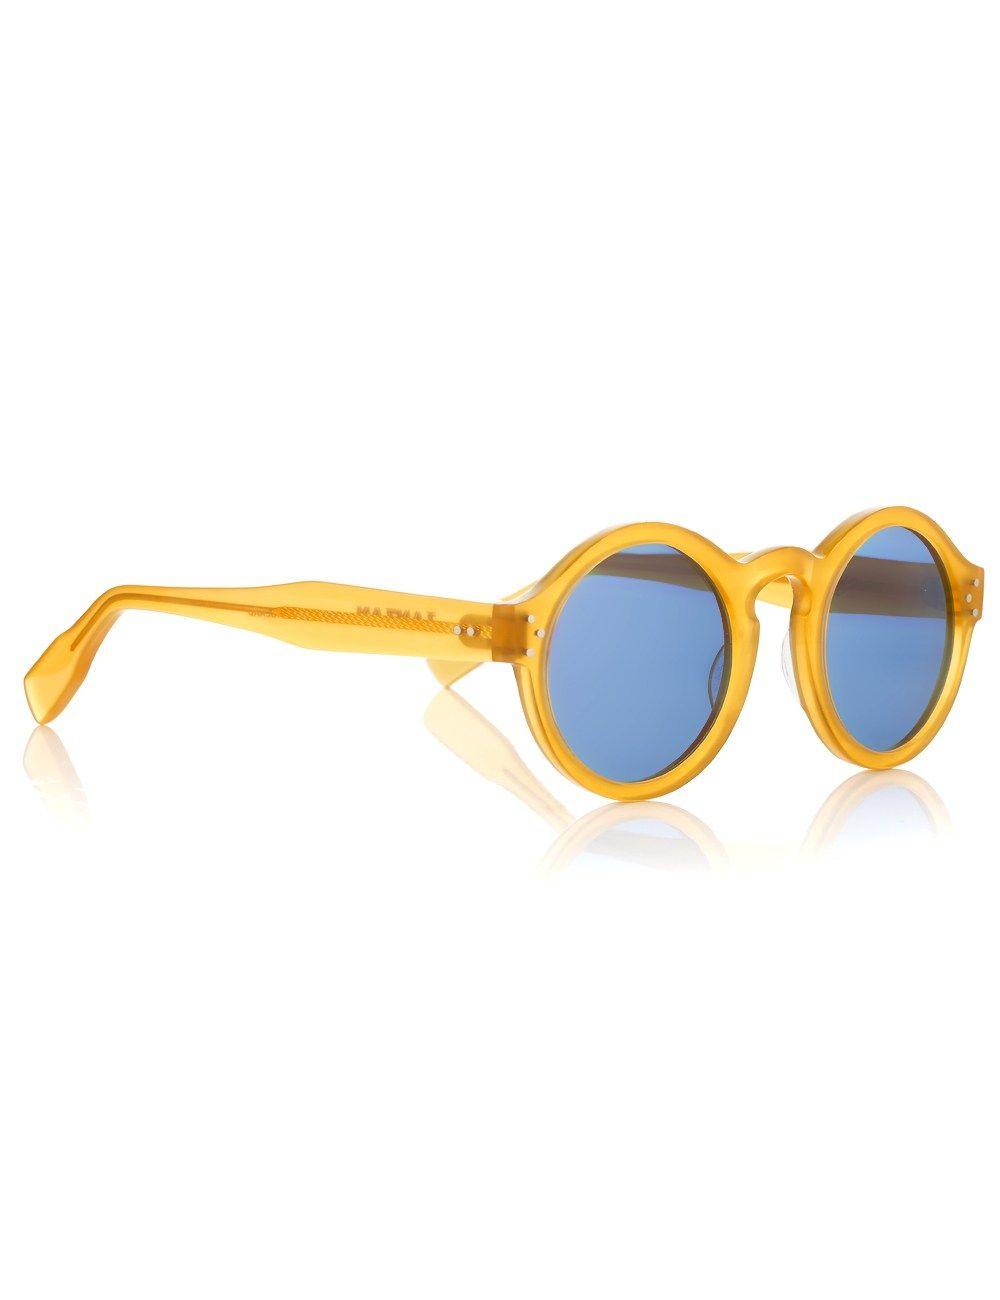 41c7ccfb7440 Yellow Round Mizaru Sunglasses